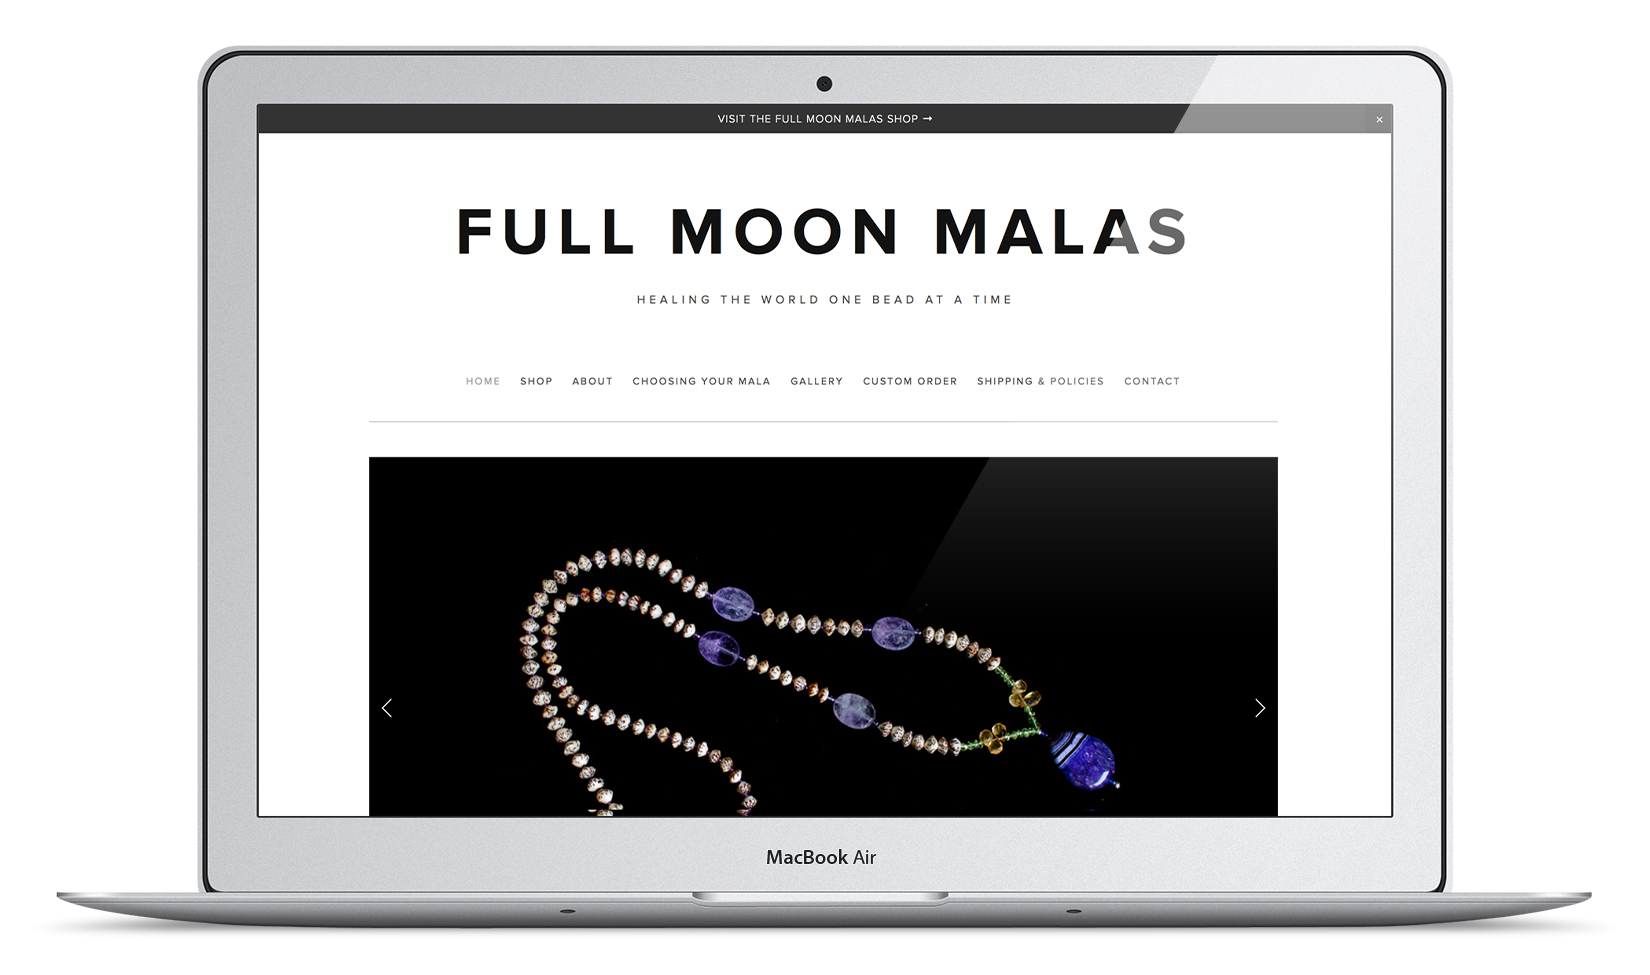 full-moon-malas-homepage.jpg